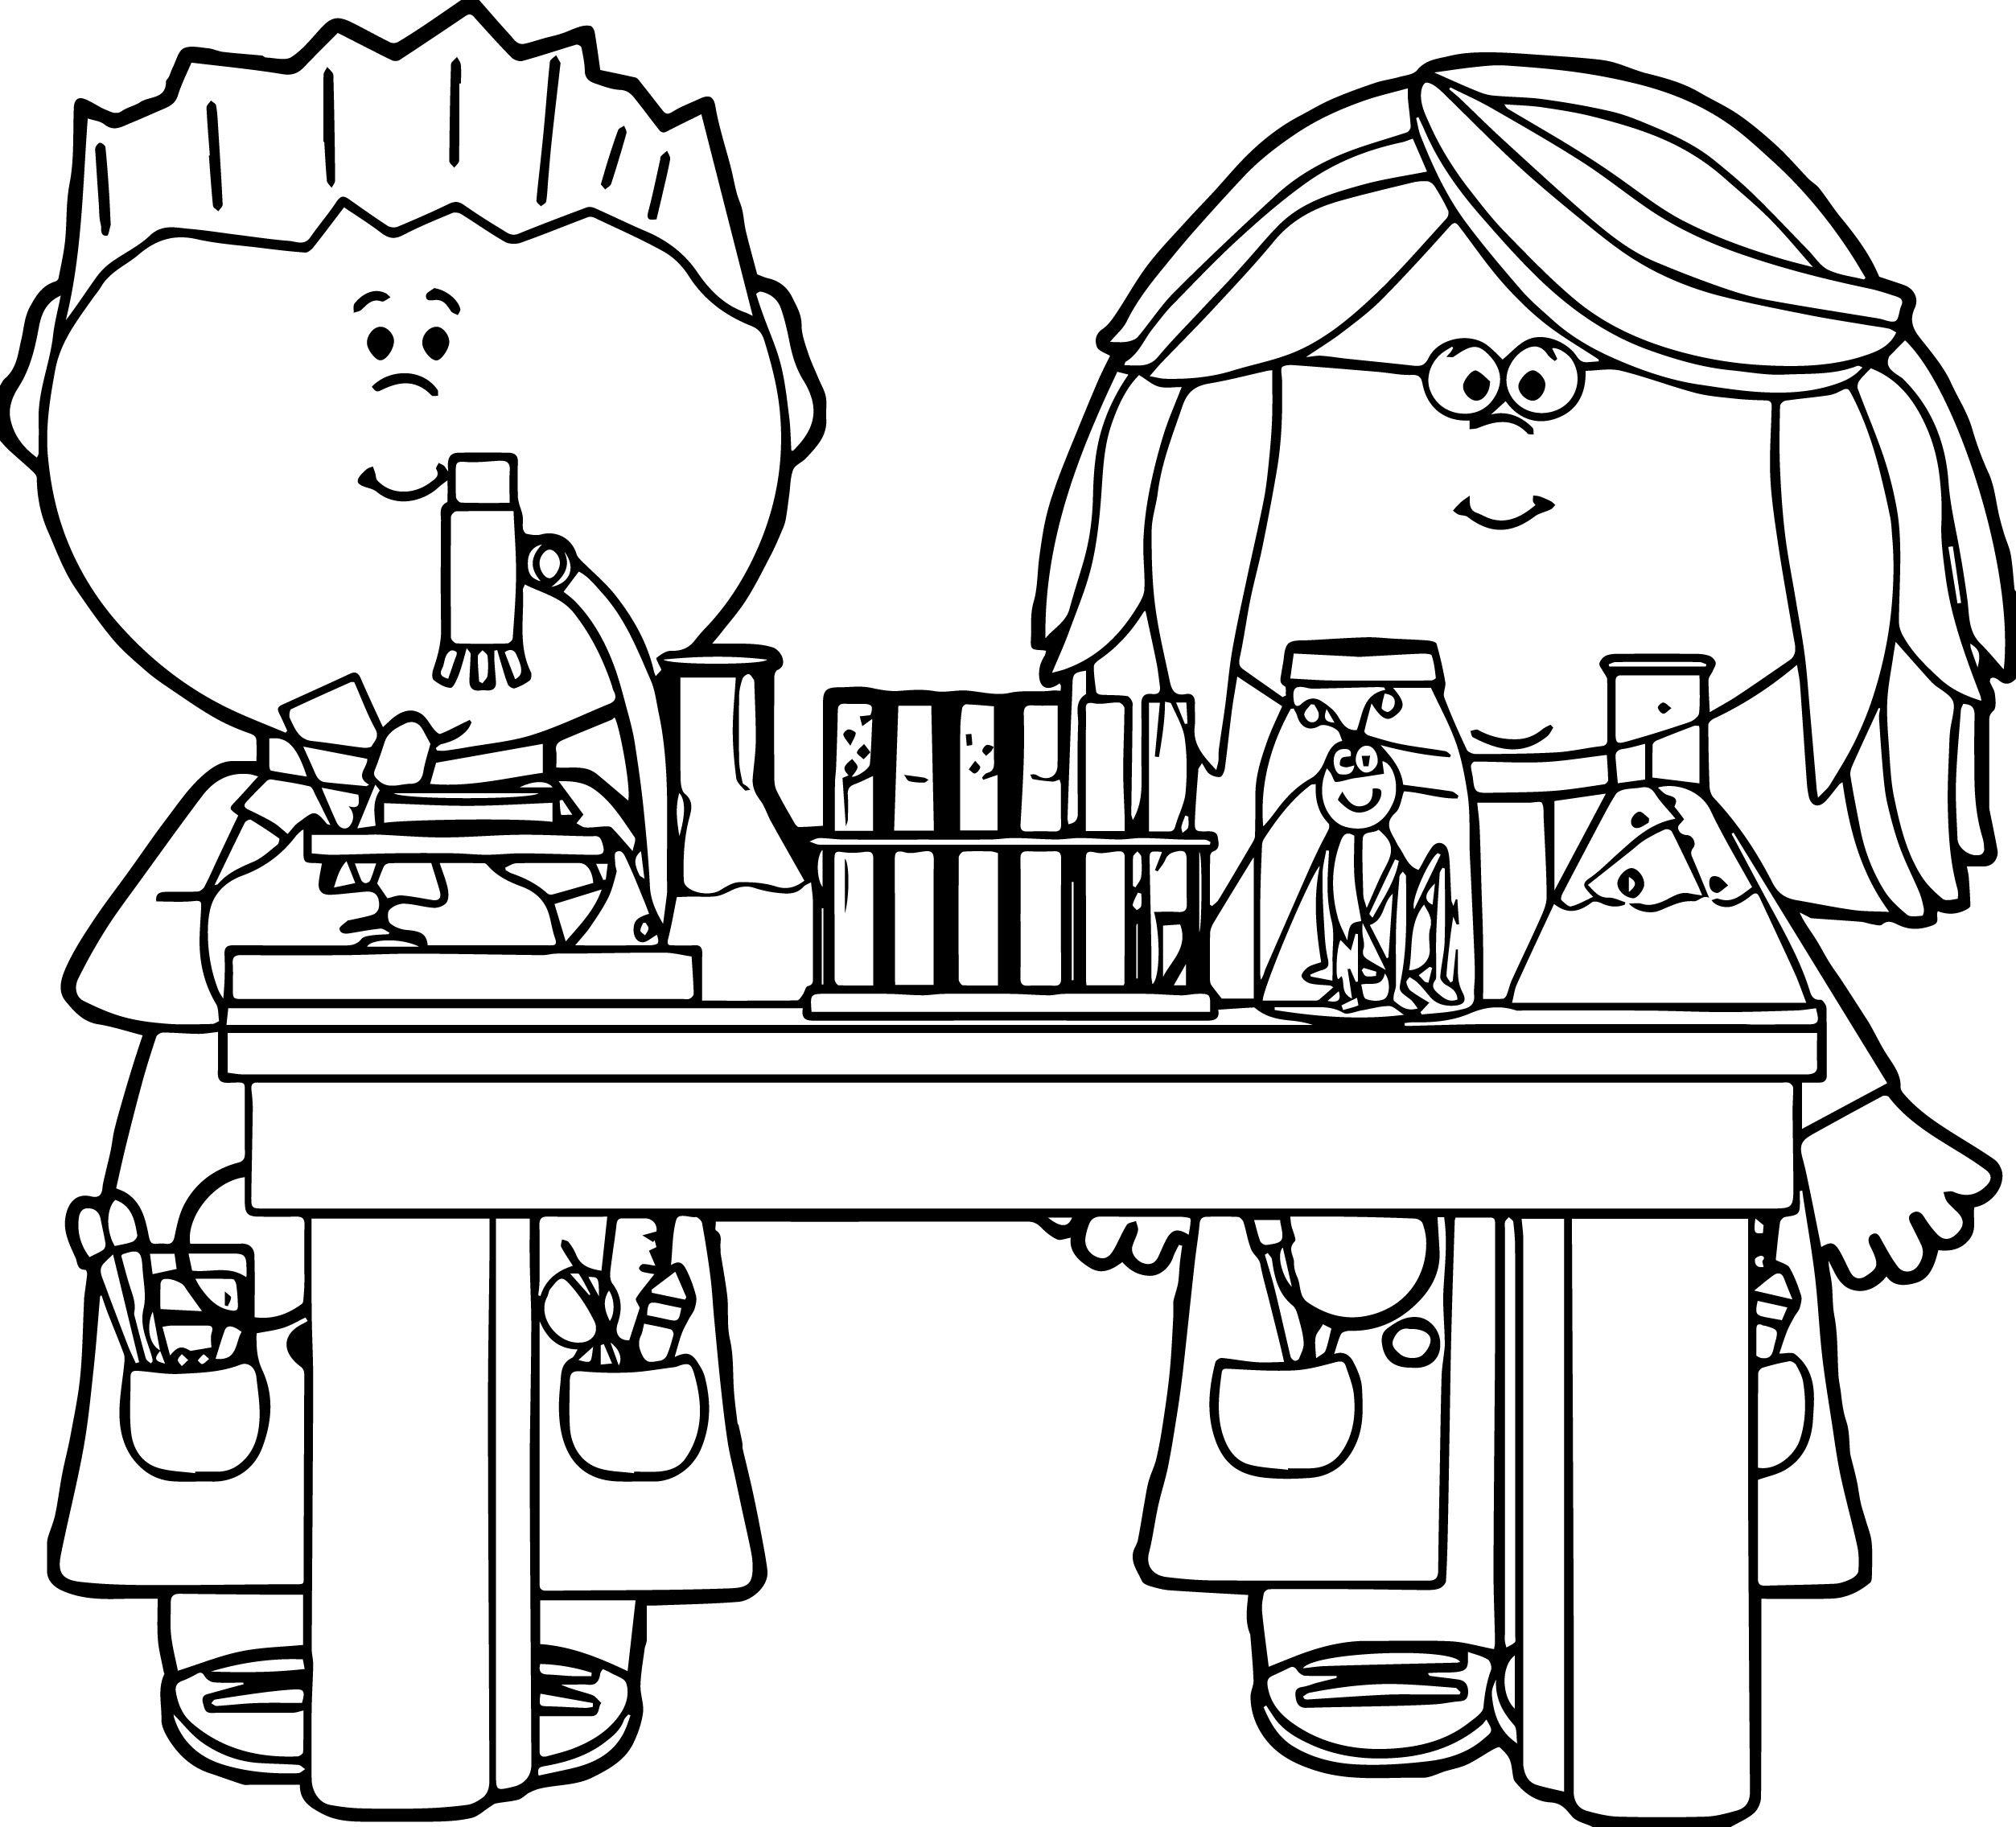 2506x2271 Kids In Science Class Clip Art Kids In Science Class Vector Image